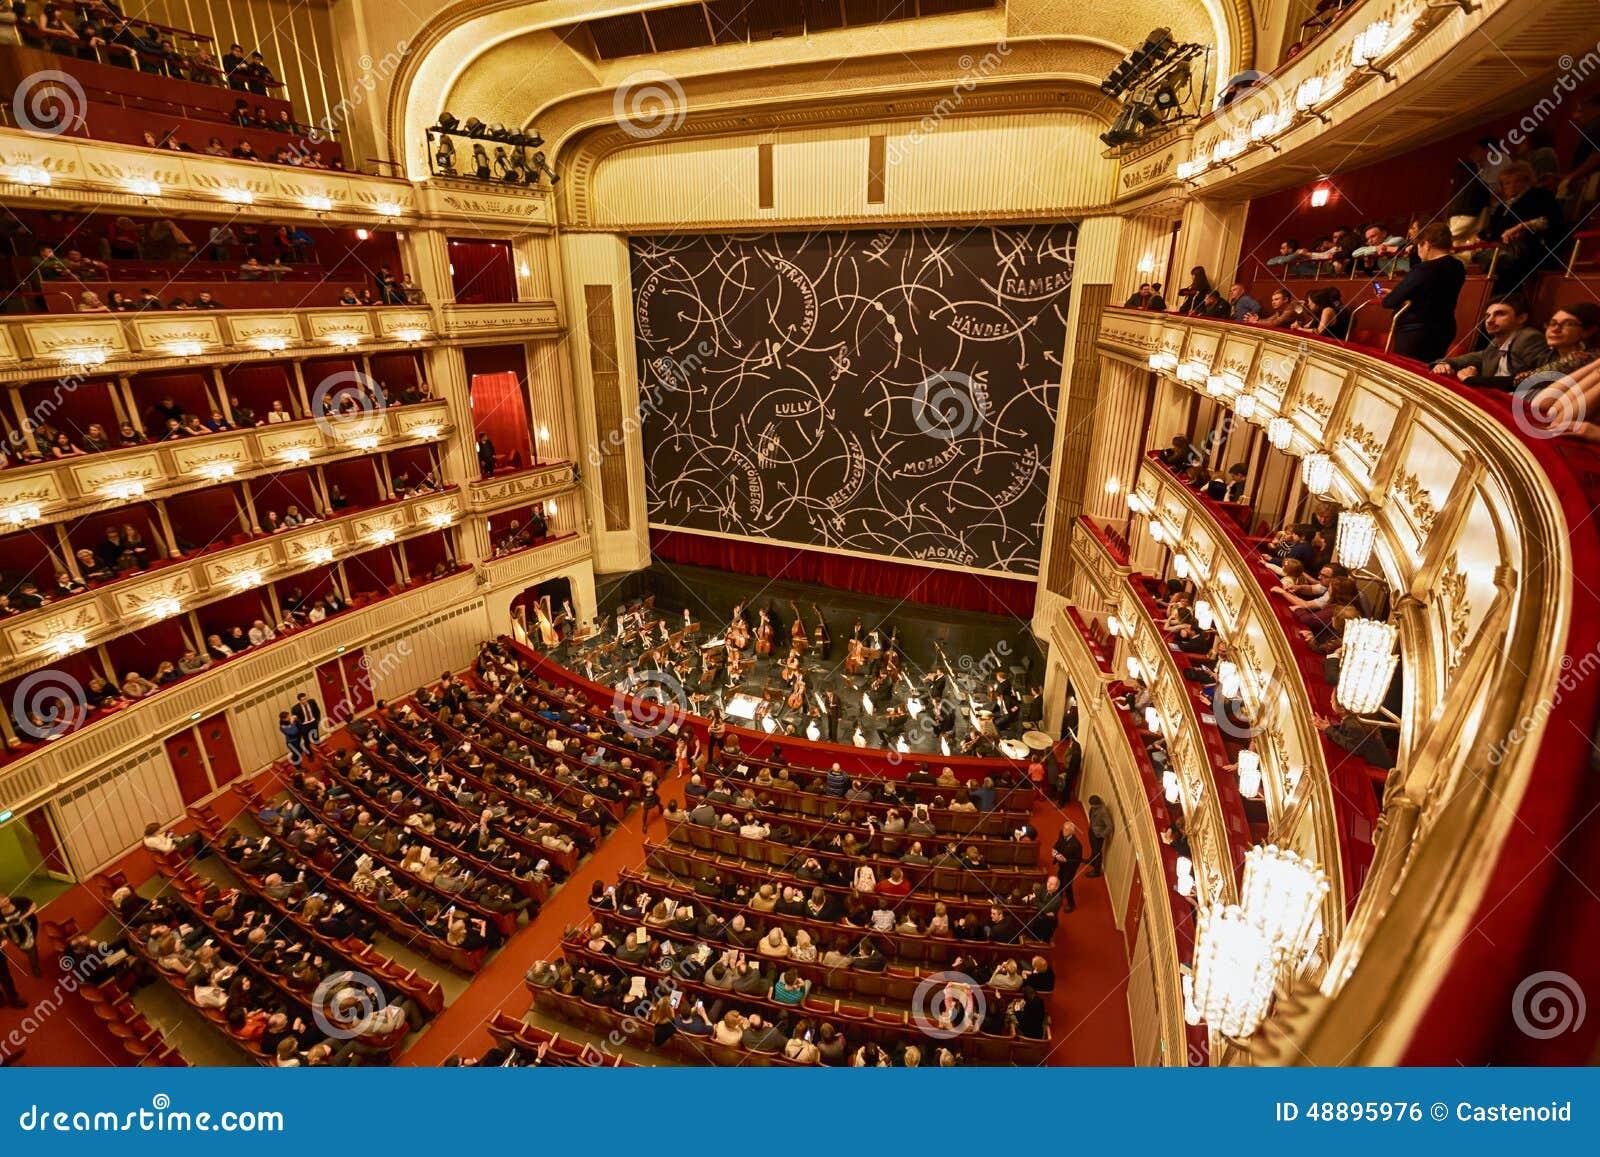 Balconies Of Vienna Opera House Editorial Photo - Image: 48895976